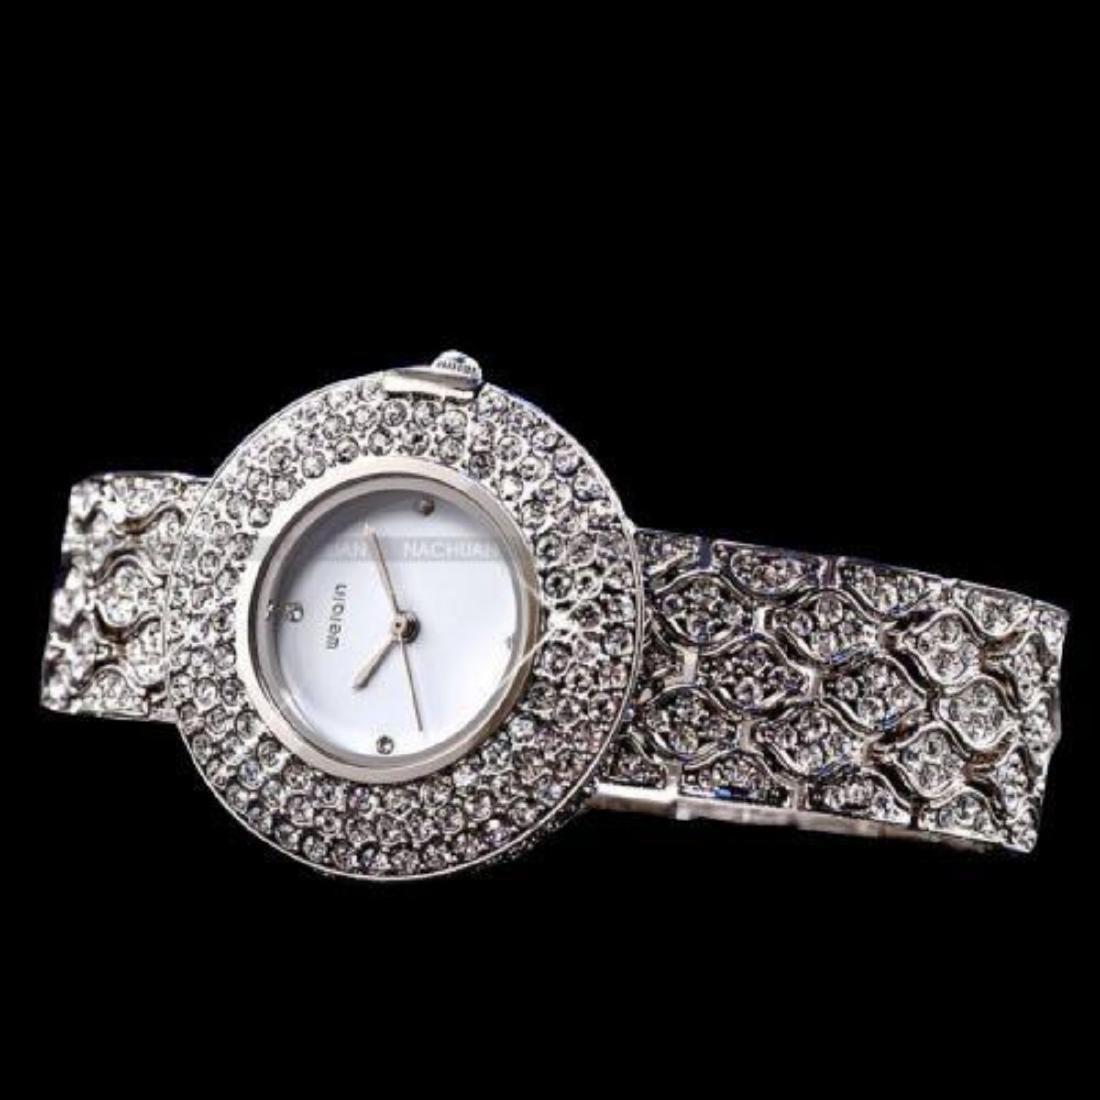 Women's Stainless Steel & Crystal Quartz Bracelet Wrist - 3